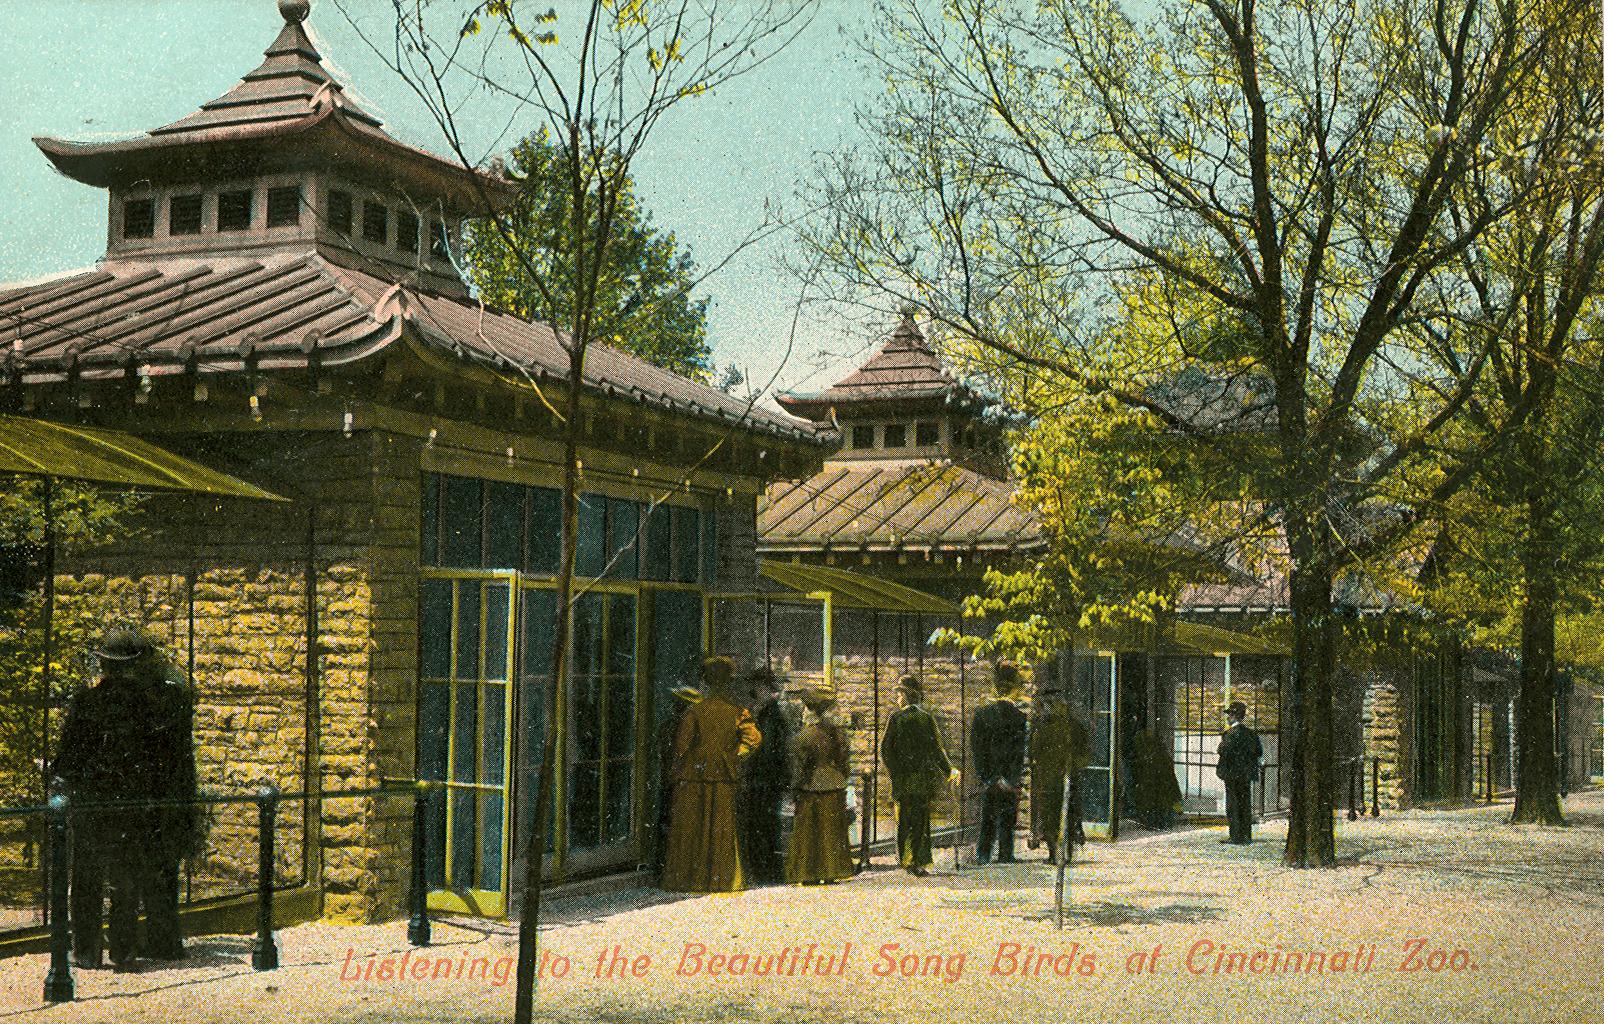 Postcard showign the original bird aviaries